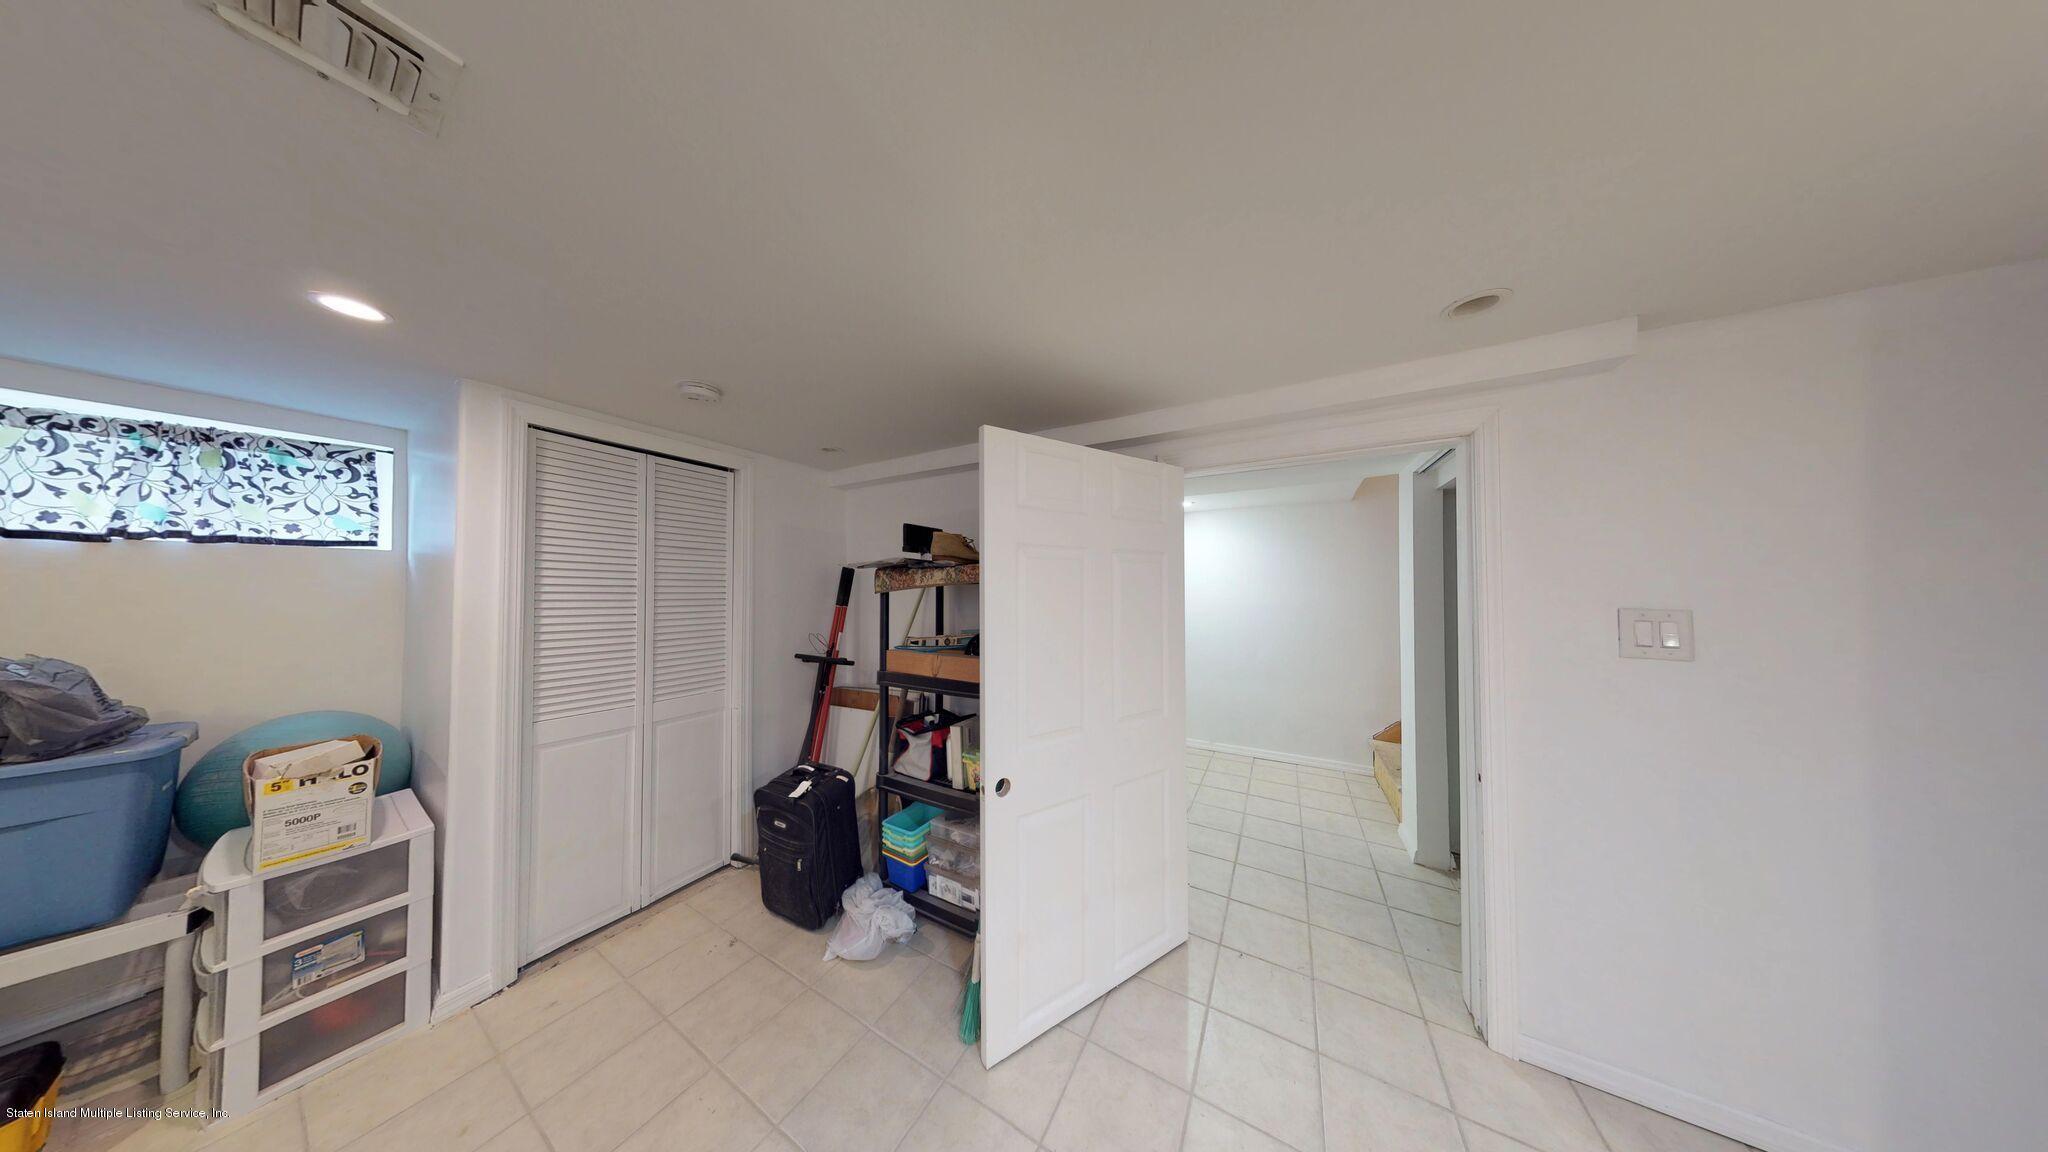 Single Family - Detached 128 Pelton Avenue  Staten Island, NY 10310, MLS-1124023-28